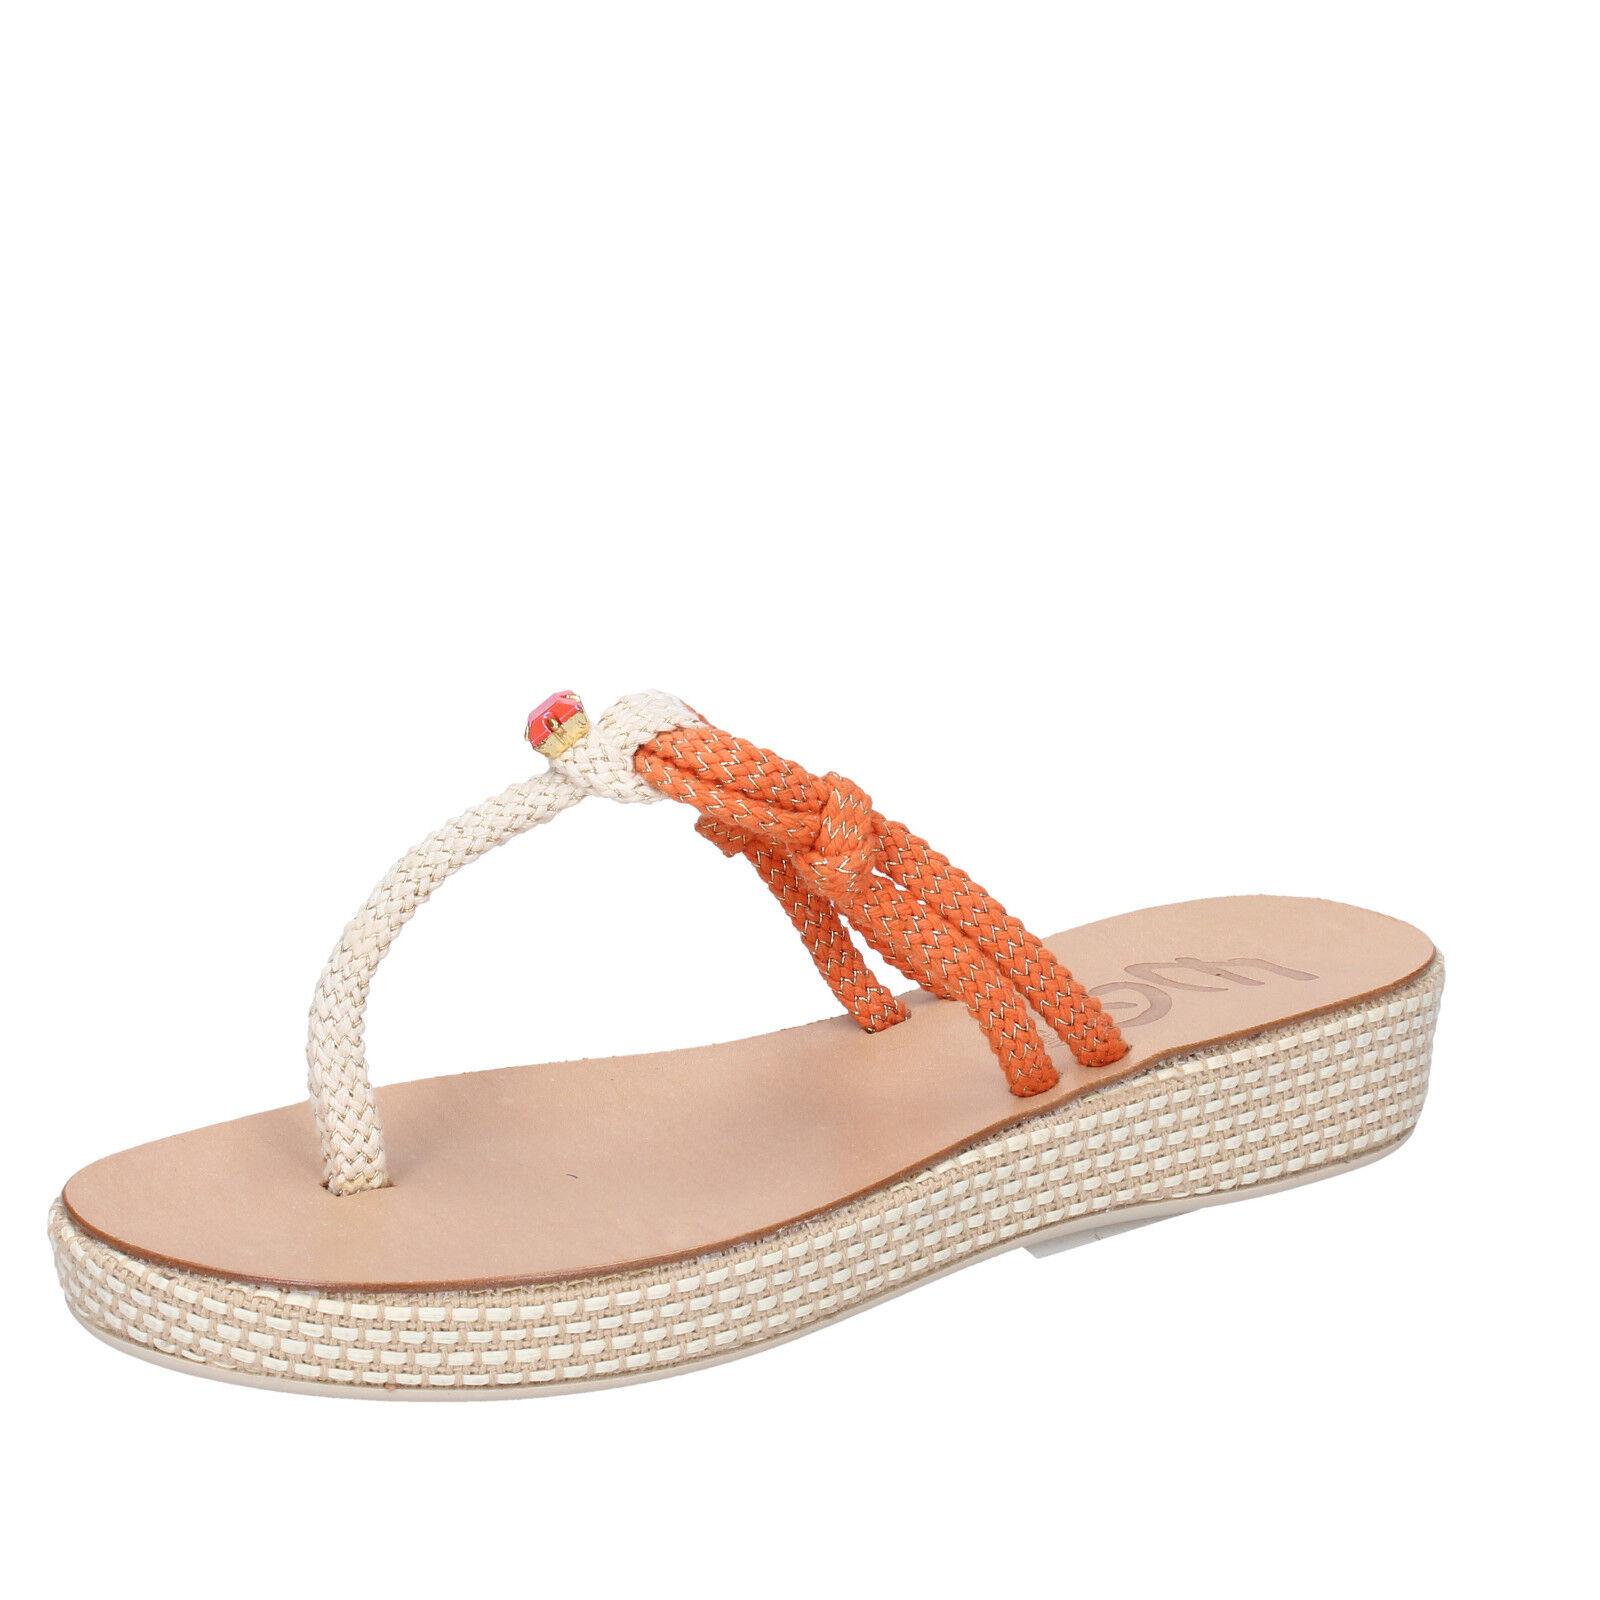 scarpe donna bianco EDDY DANIELE 37 EU sandali bianco donna arancione corda AW672 7528ea